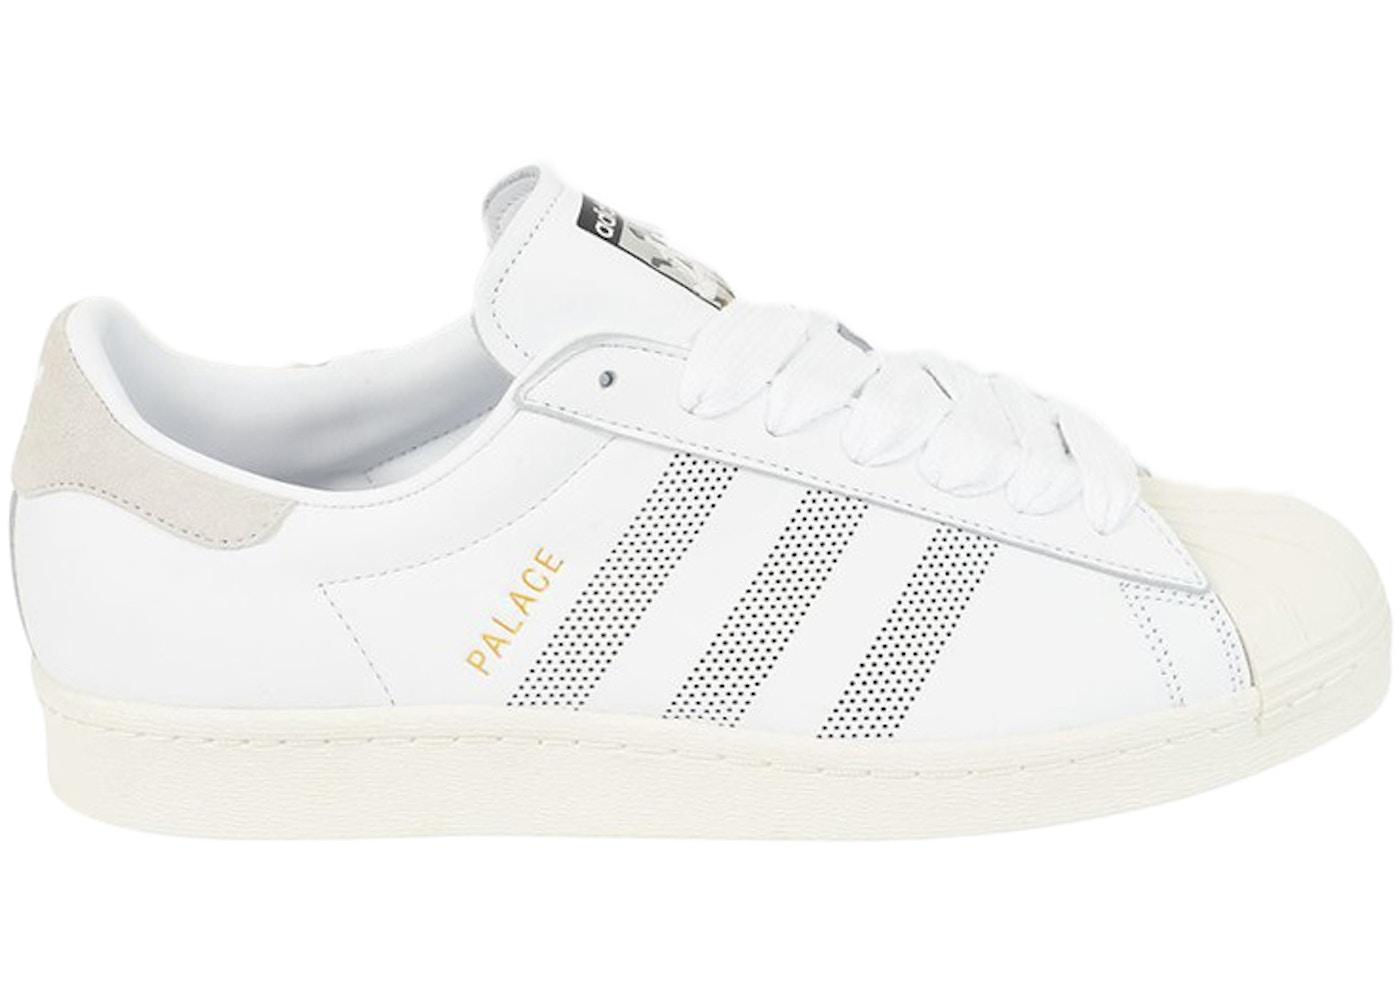 a9b529fb adidas Superstar Palace White — HypeAnalyzer